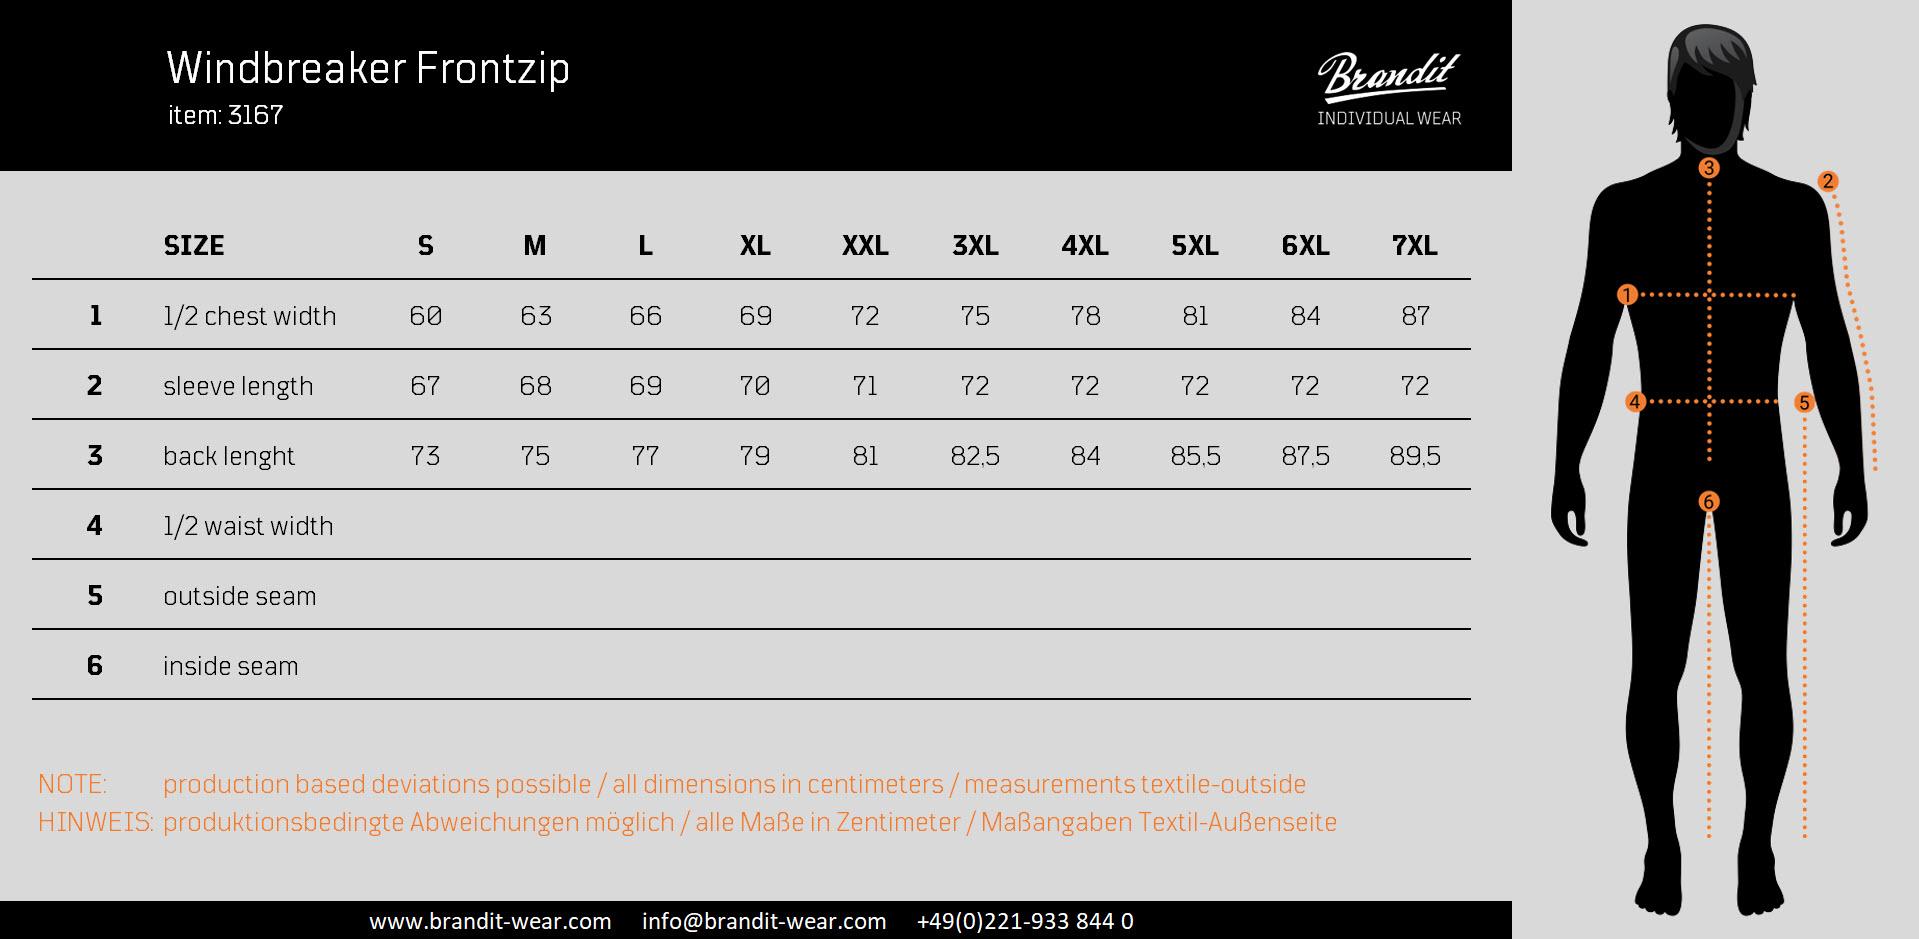 3167-Windbreaker-Frontzip